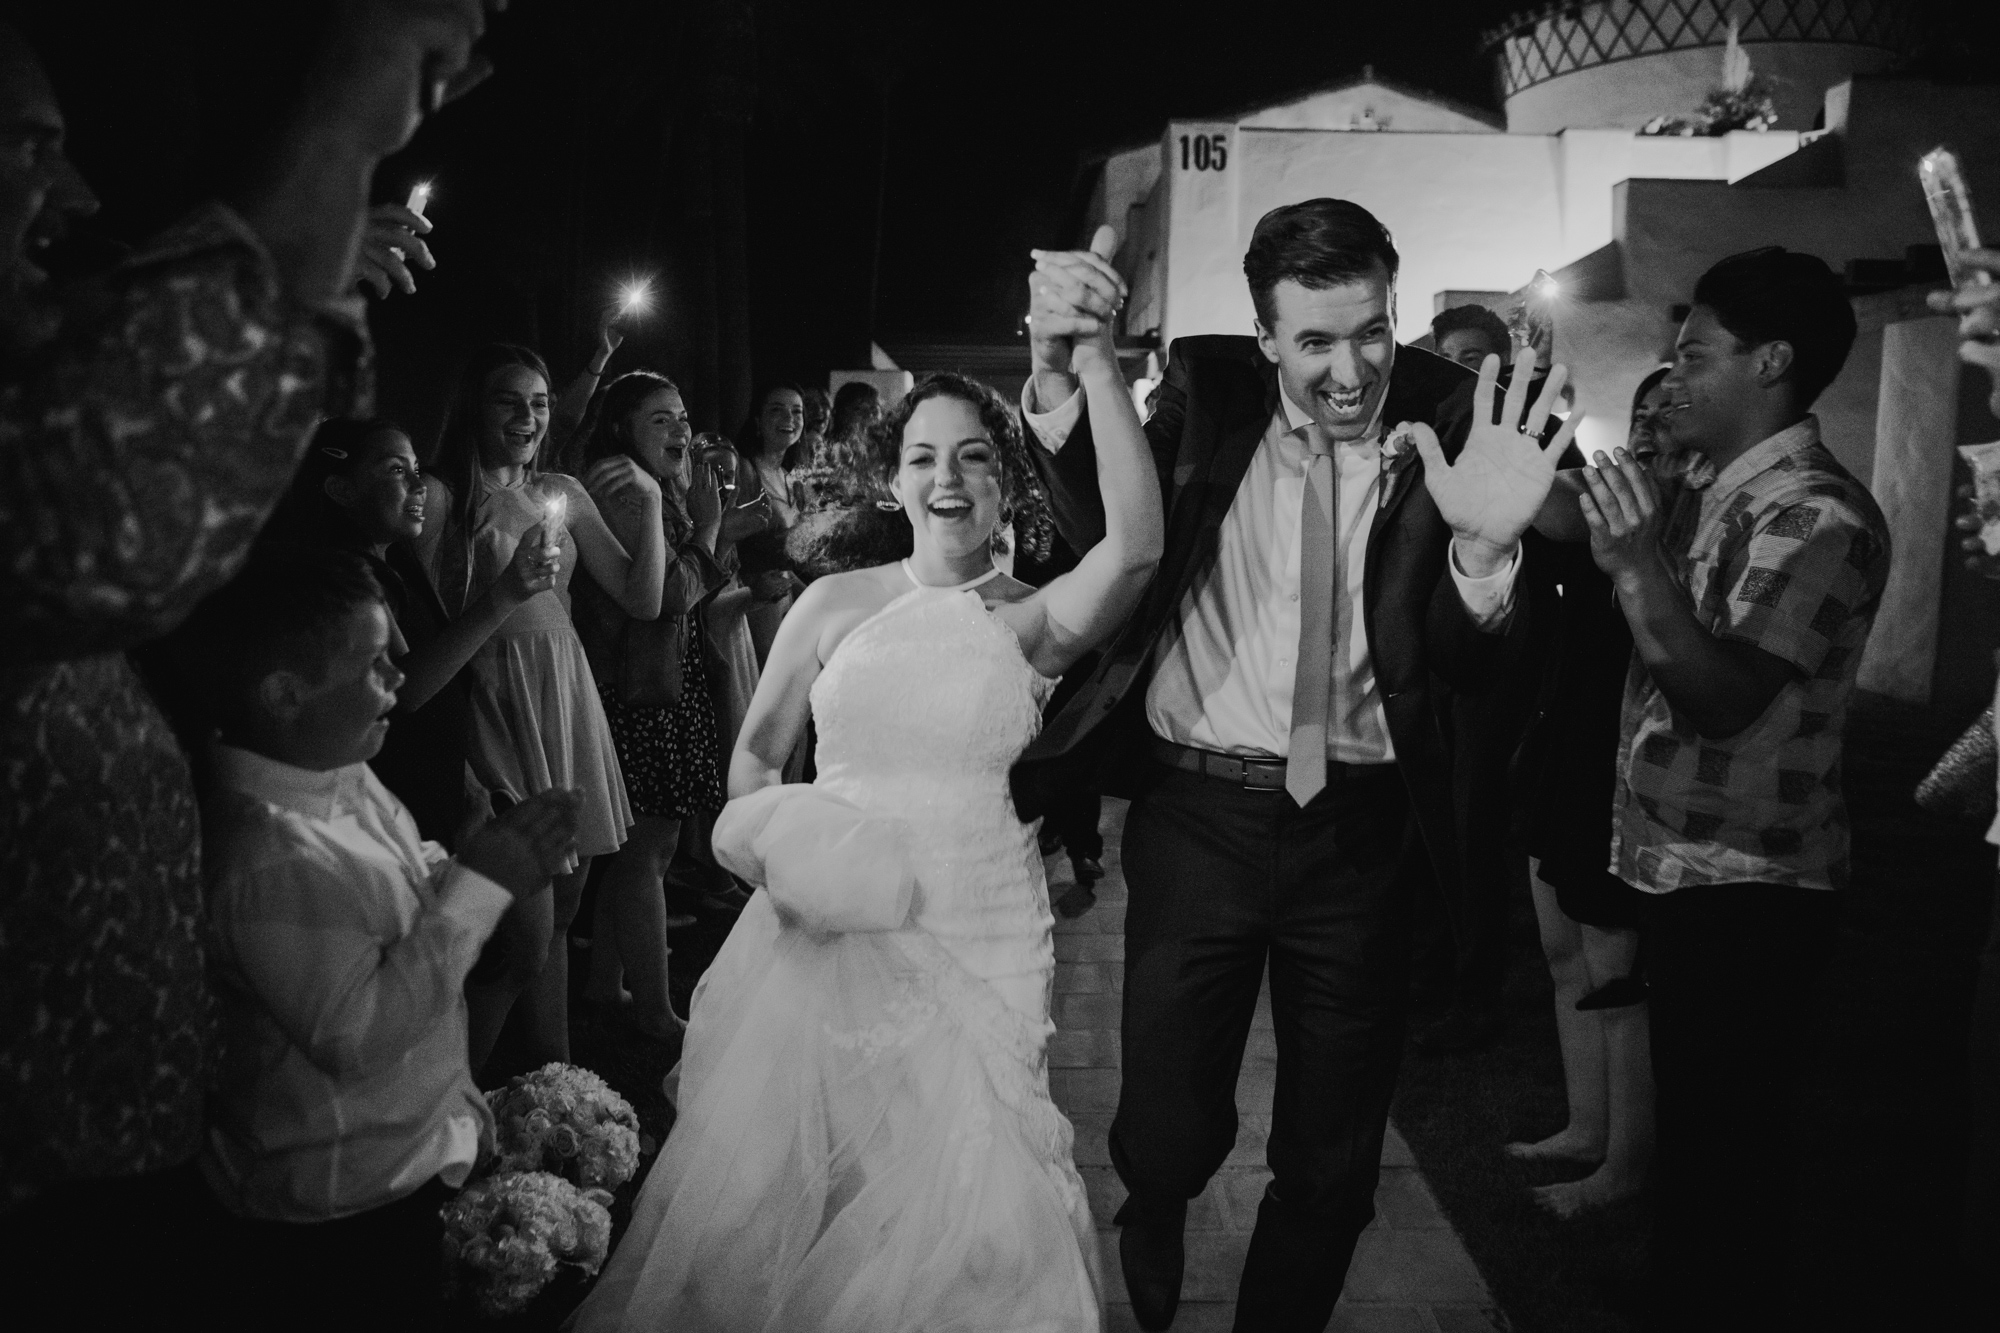 170-destination-wedding-san-clemente-california.jpg